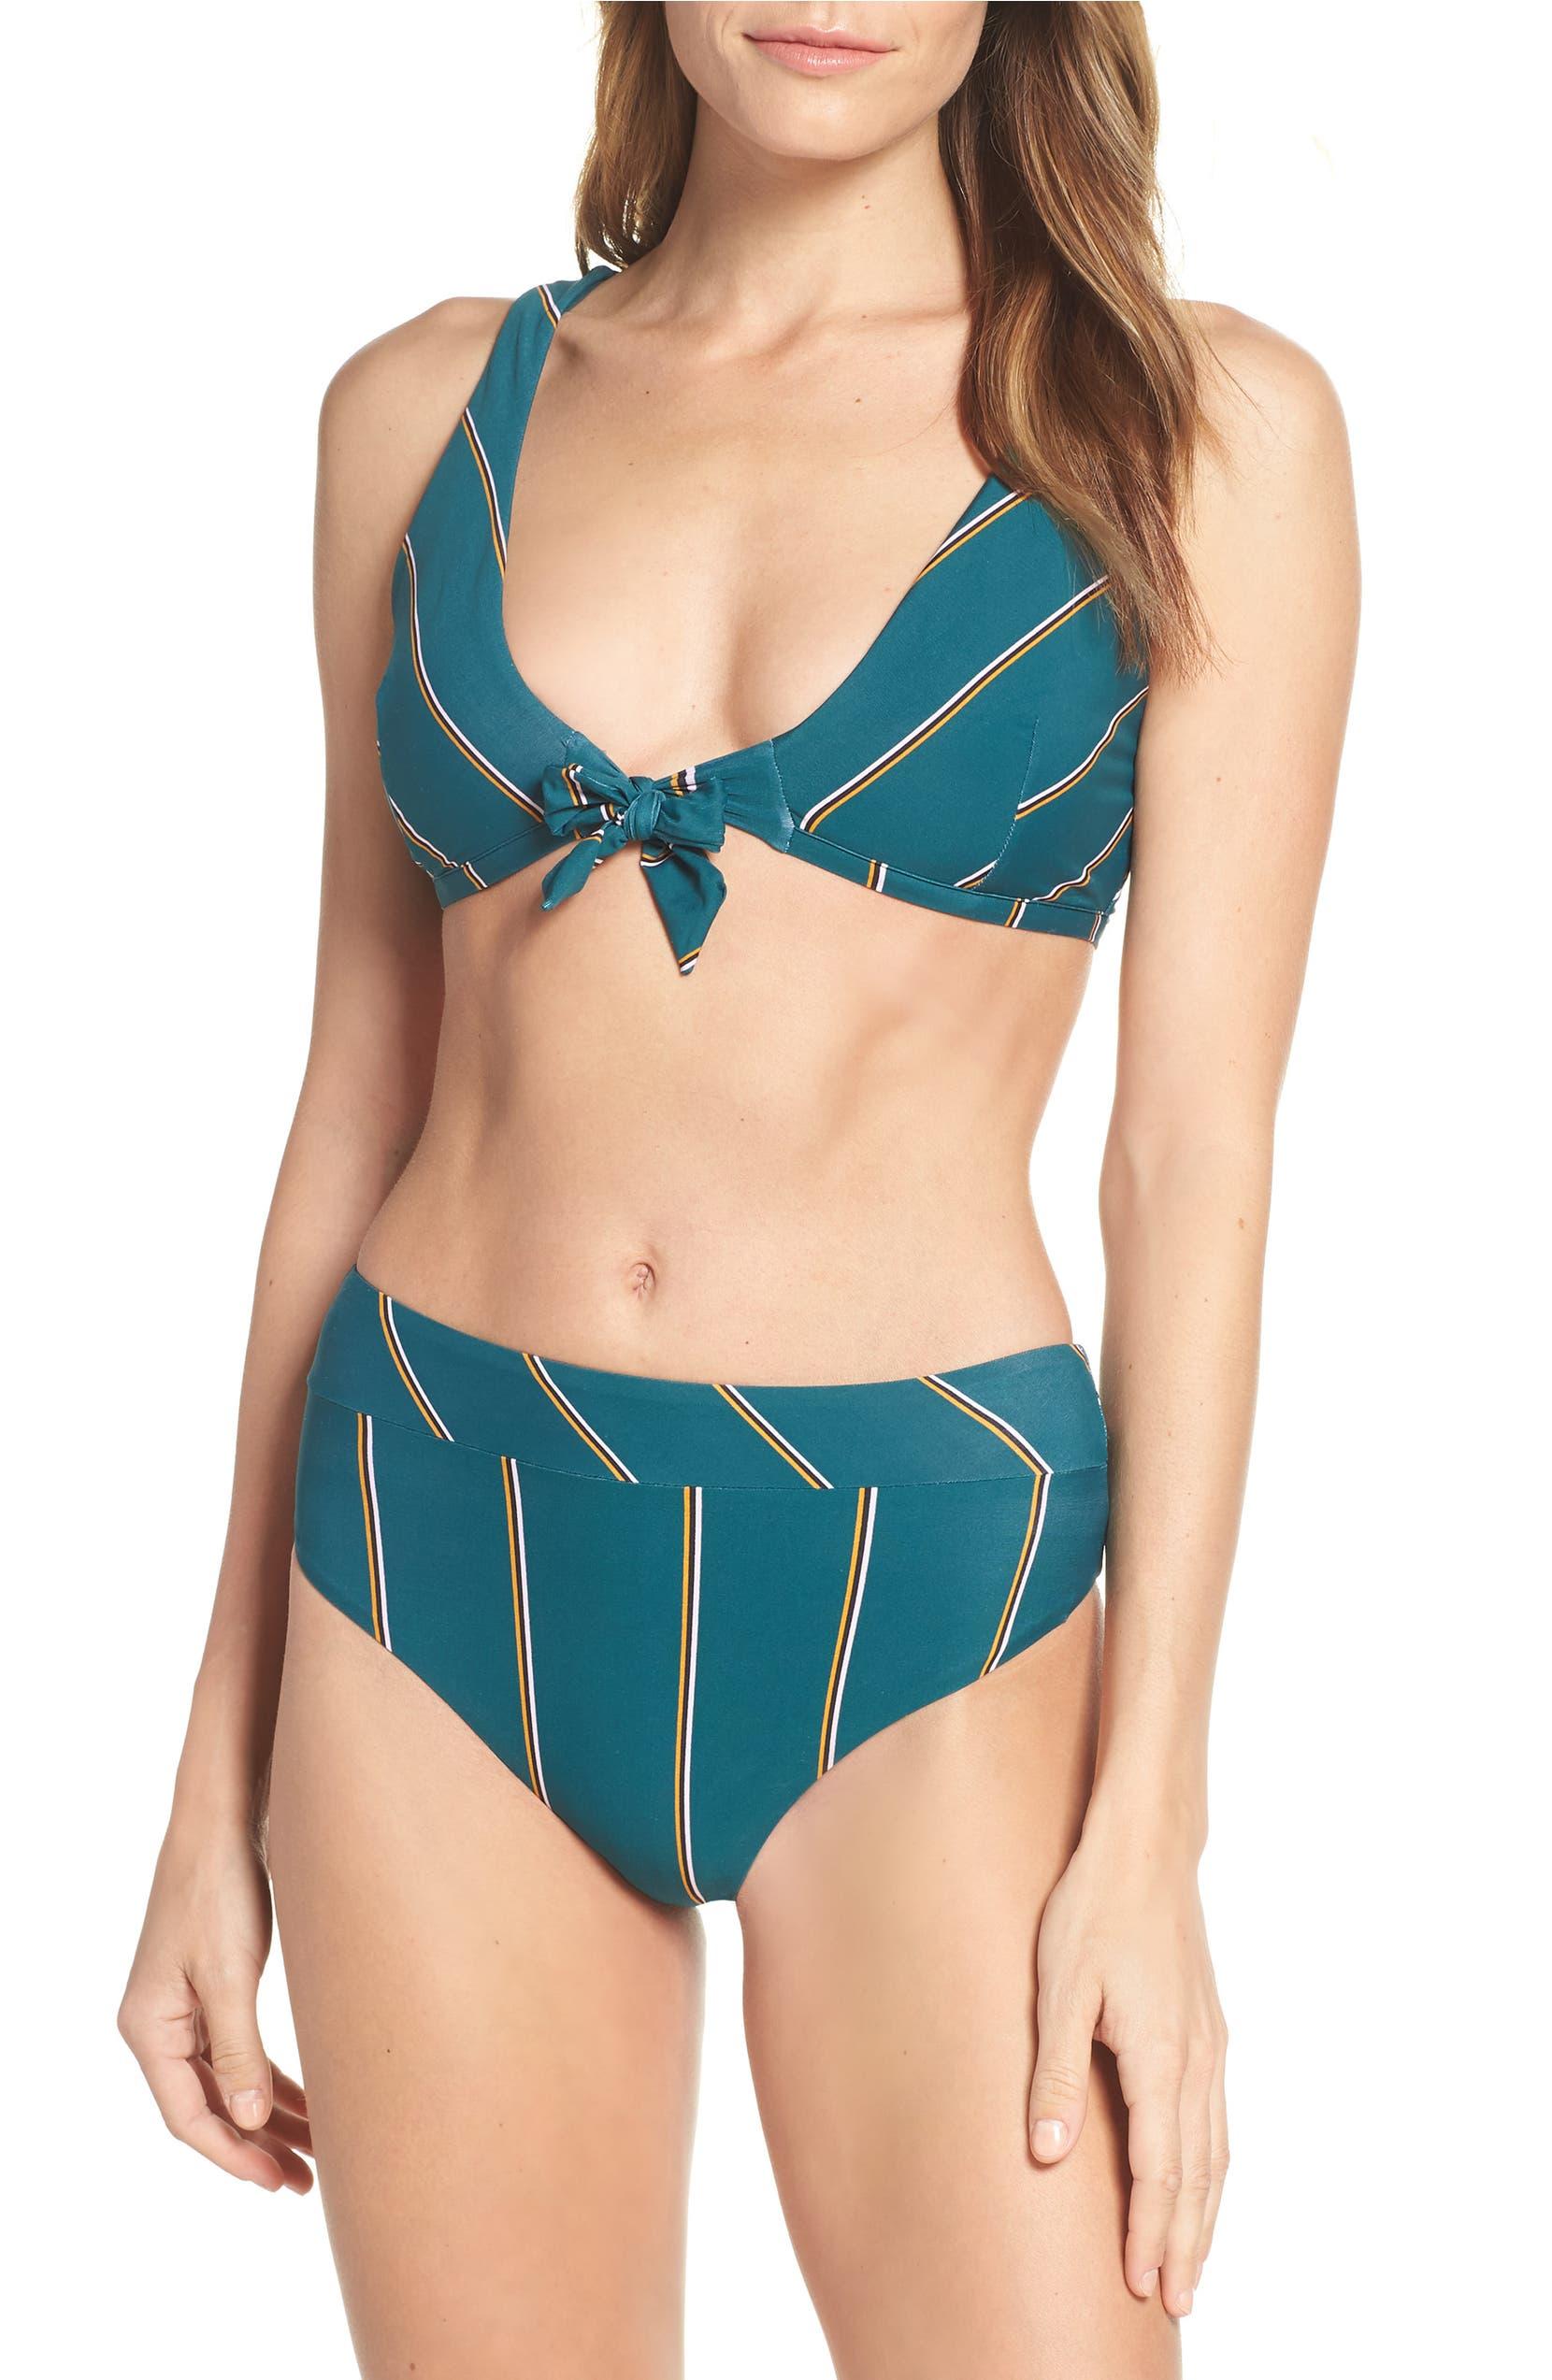 02297643a45a9 Seafolly Aralia Tie Front Bikini Top   Nordstrom